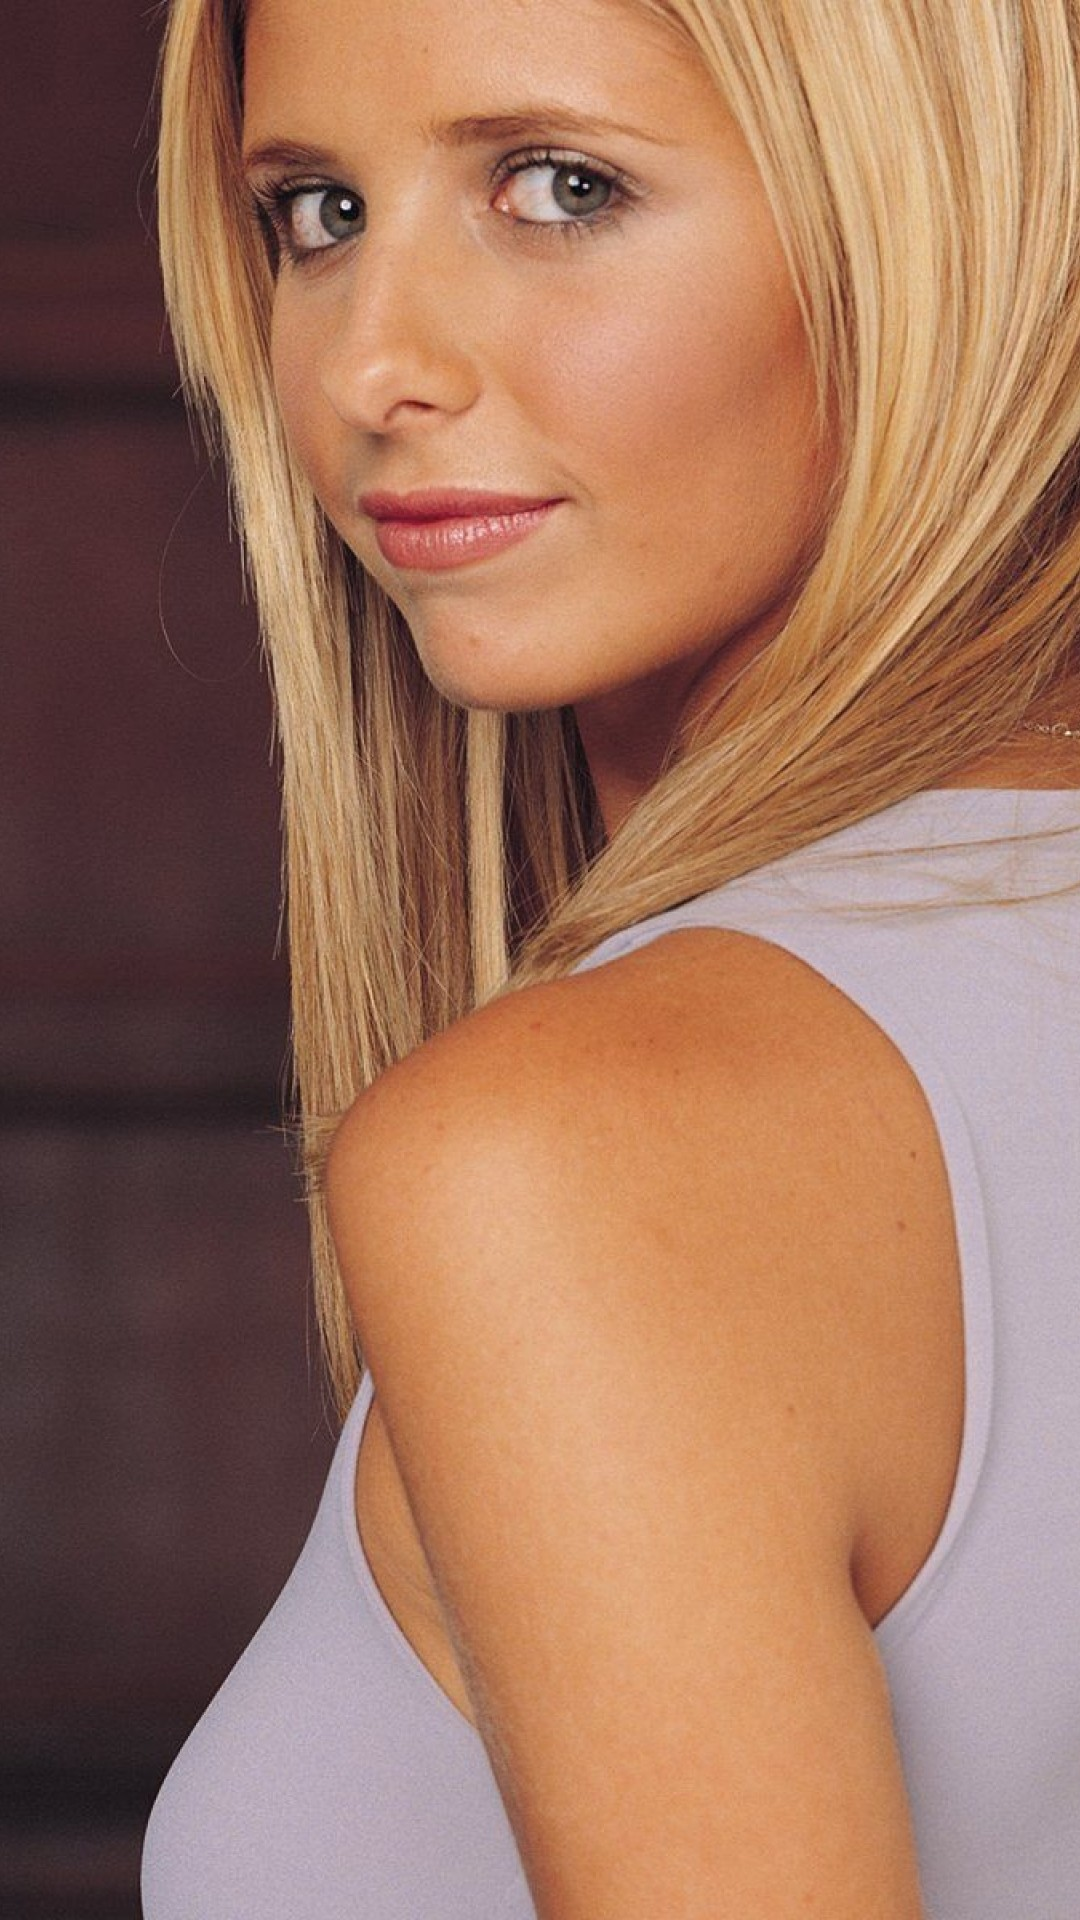 Buffy Summers Hd Wallpaper Iphone 6 6s Plus Hd Wallpaper